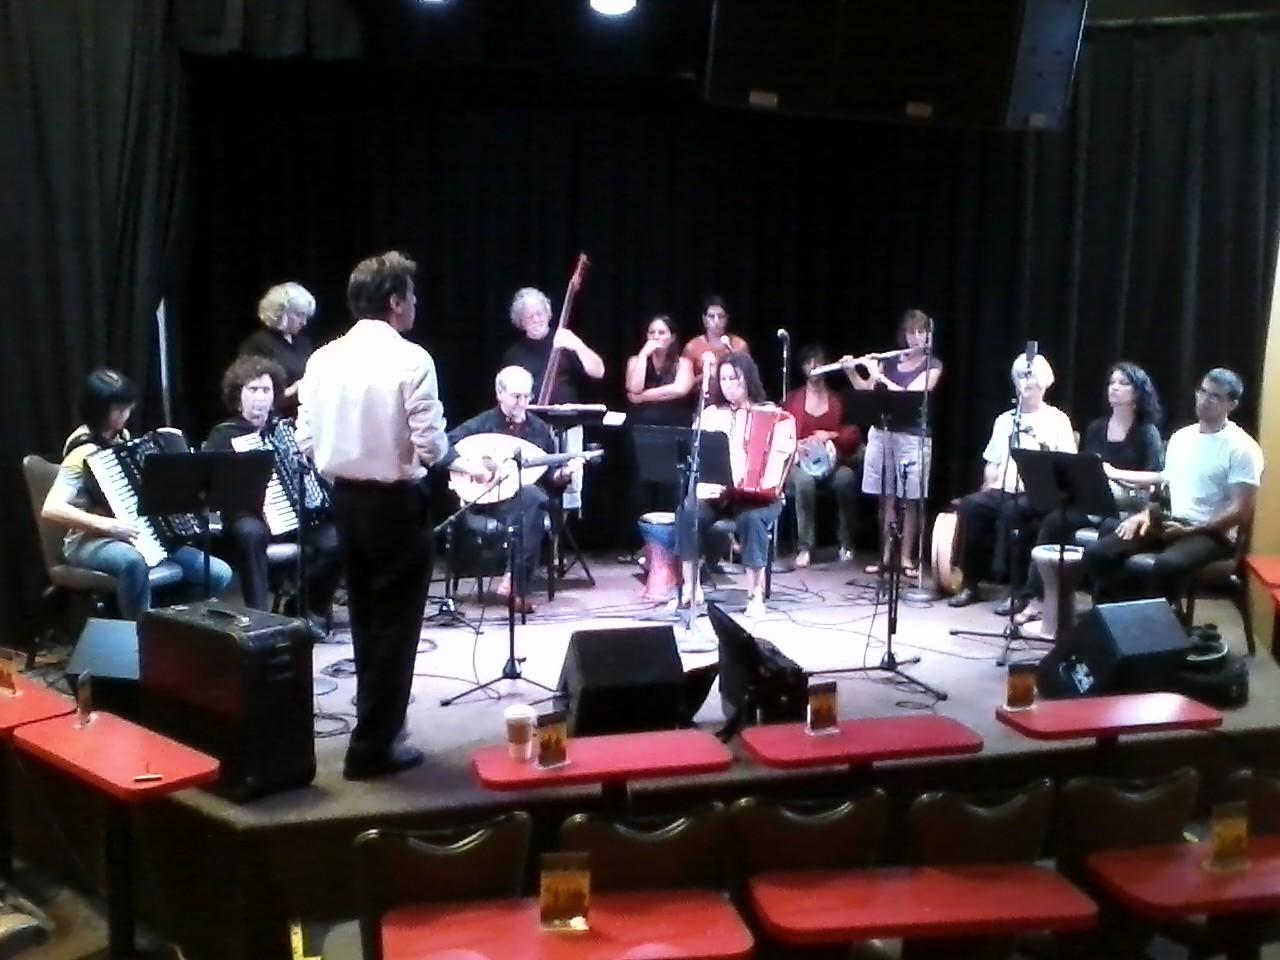 2014 Ensemble rehearsing onstage at Kuumbwa Jazz